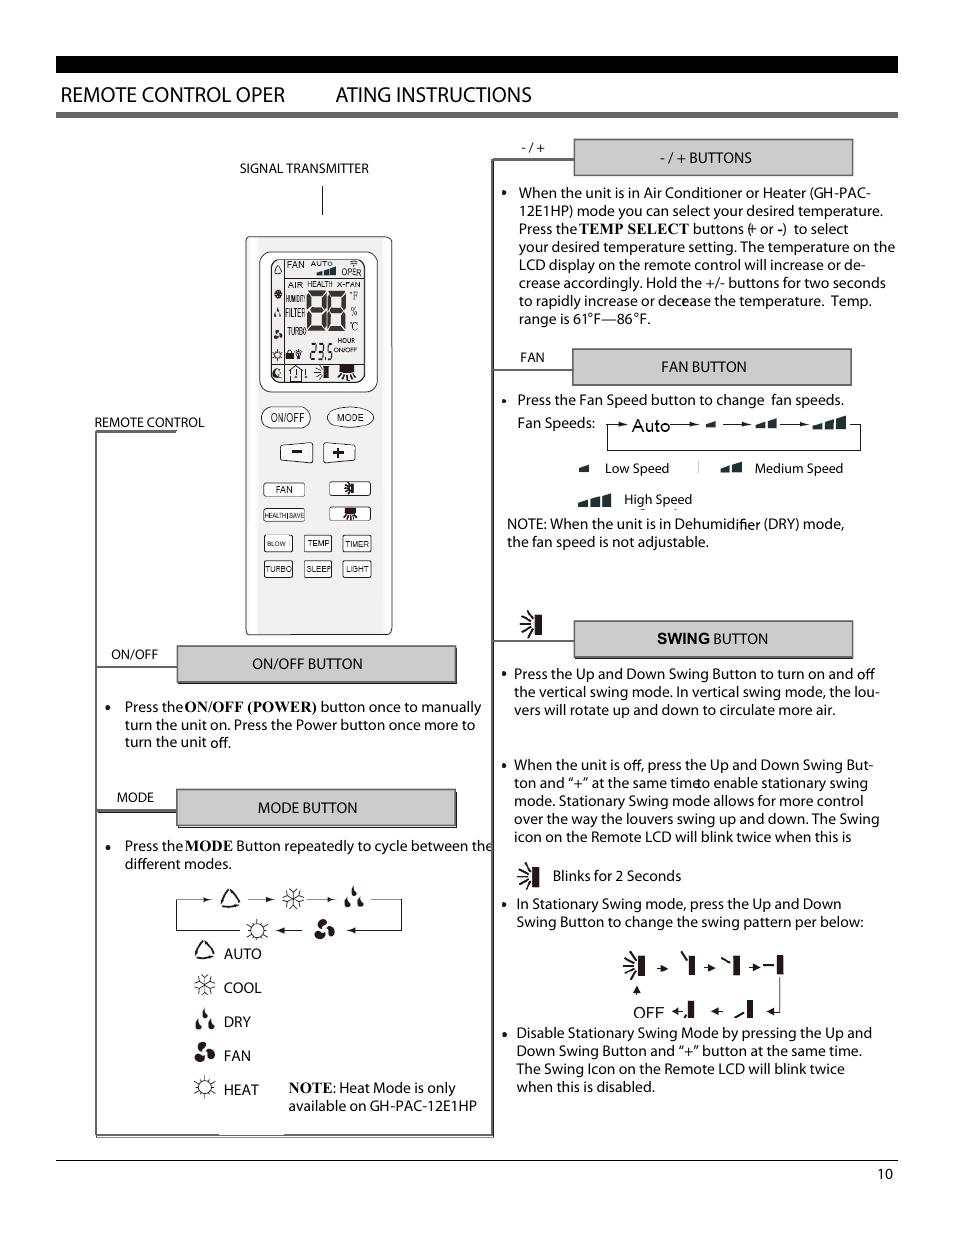 Pinguino Portable Air Conditioner With Remote Control Manual Guide